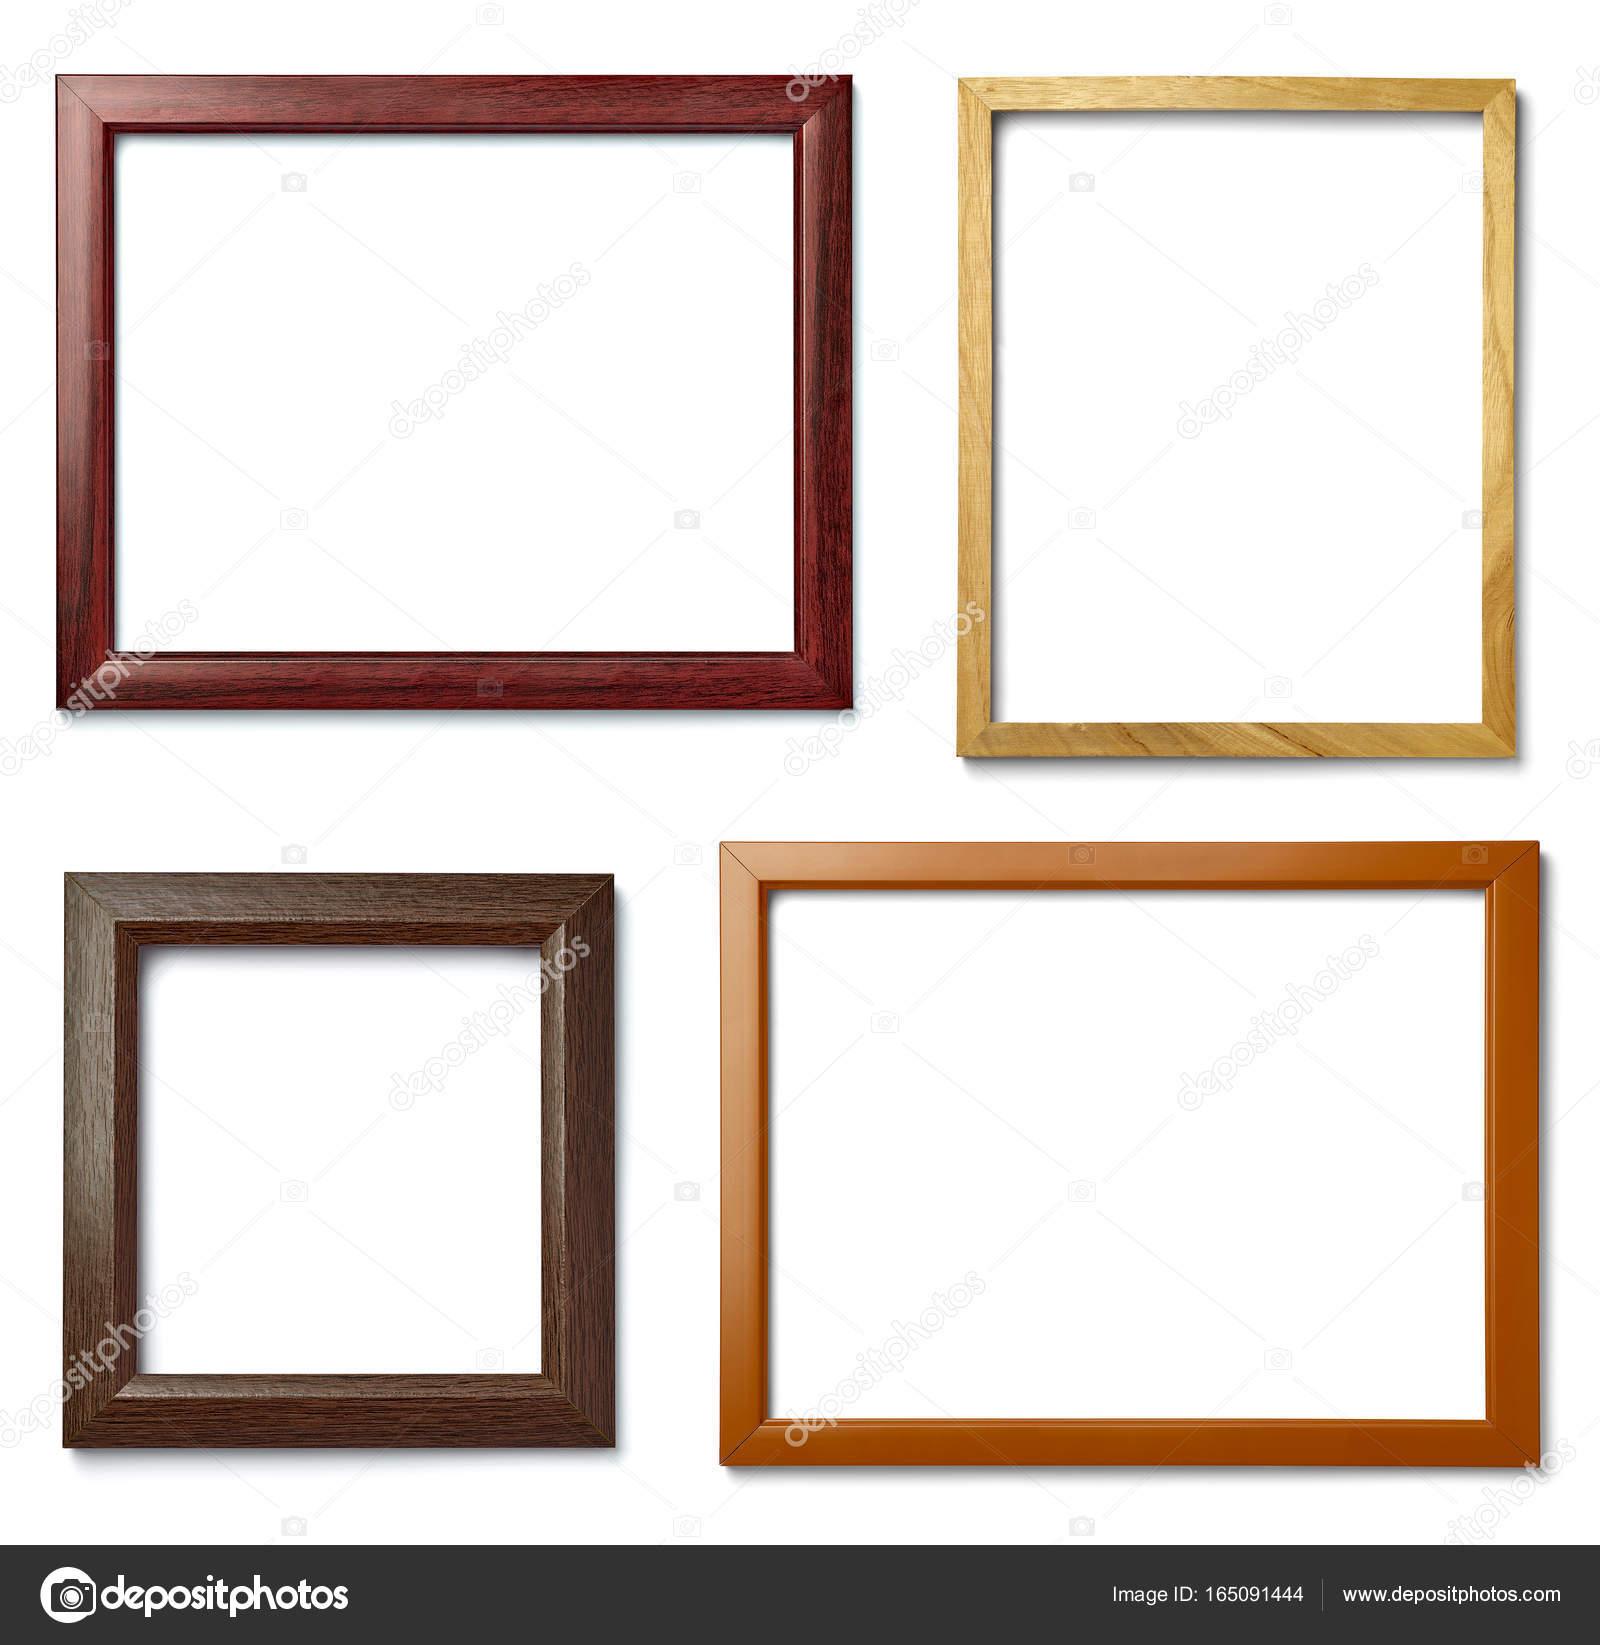 Vintage-Rahmen Holz Hintergrundbild — Stockfoto © PicsFive #165091444